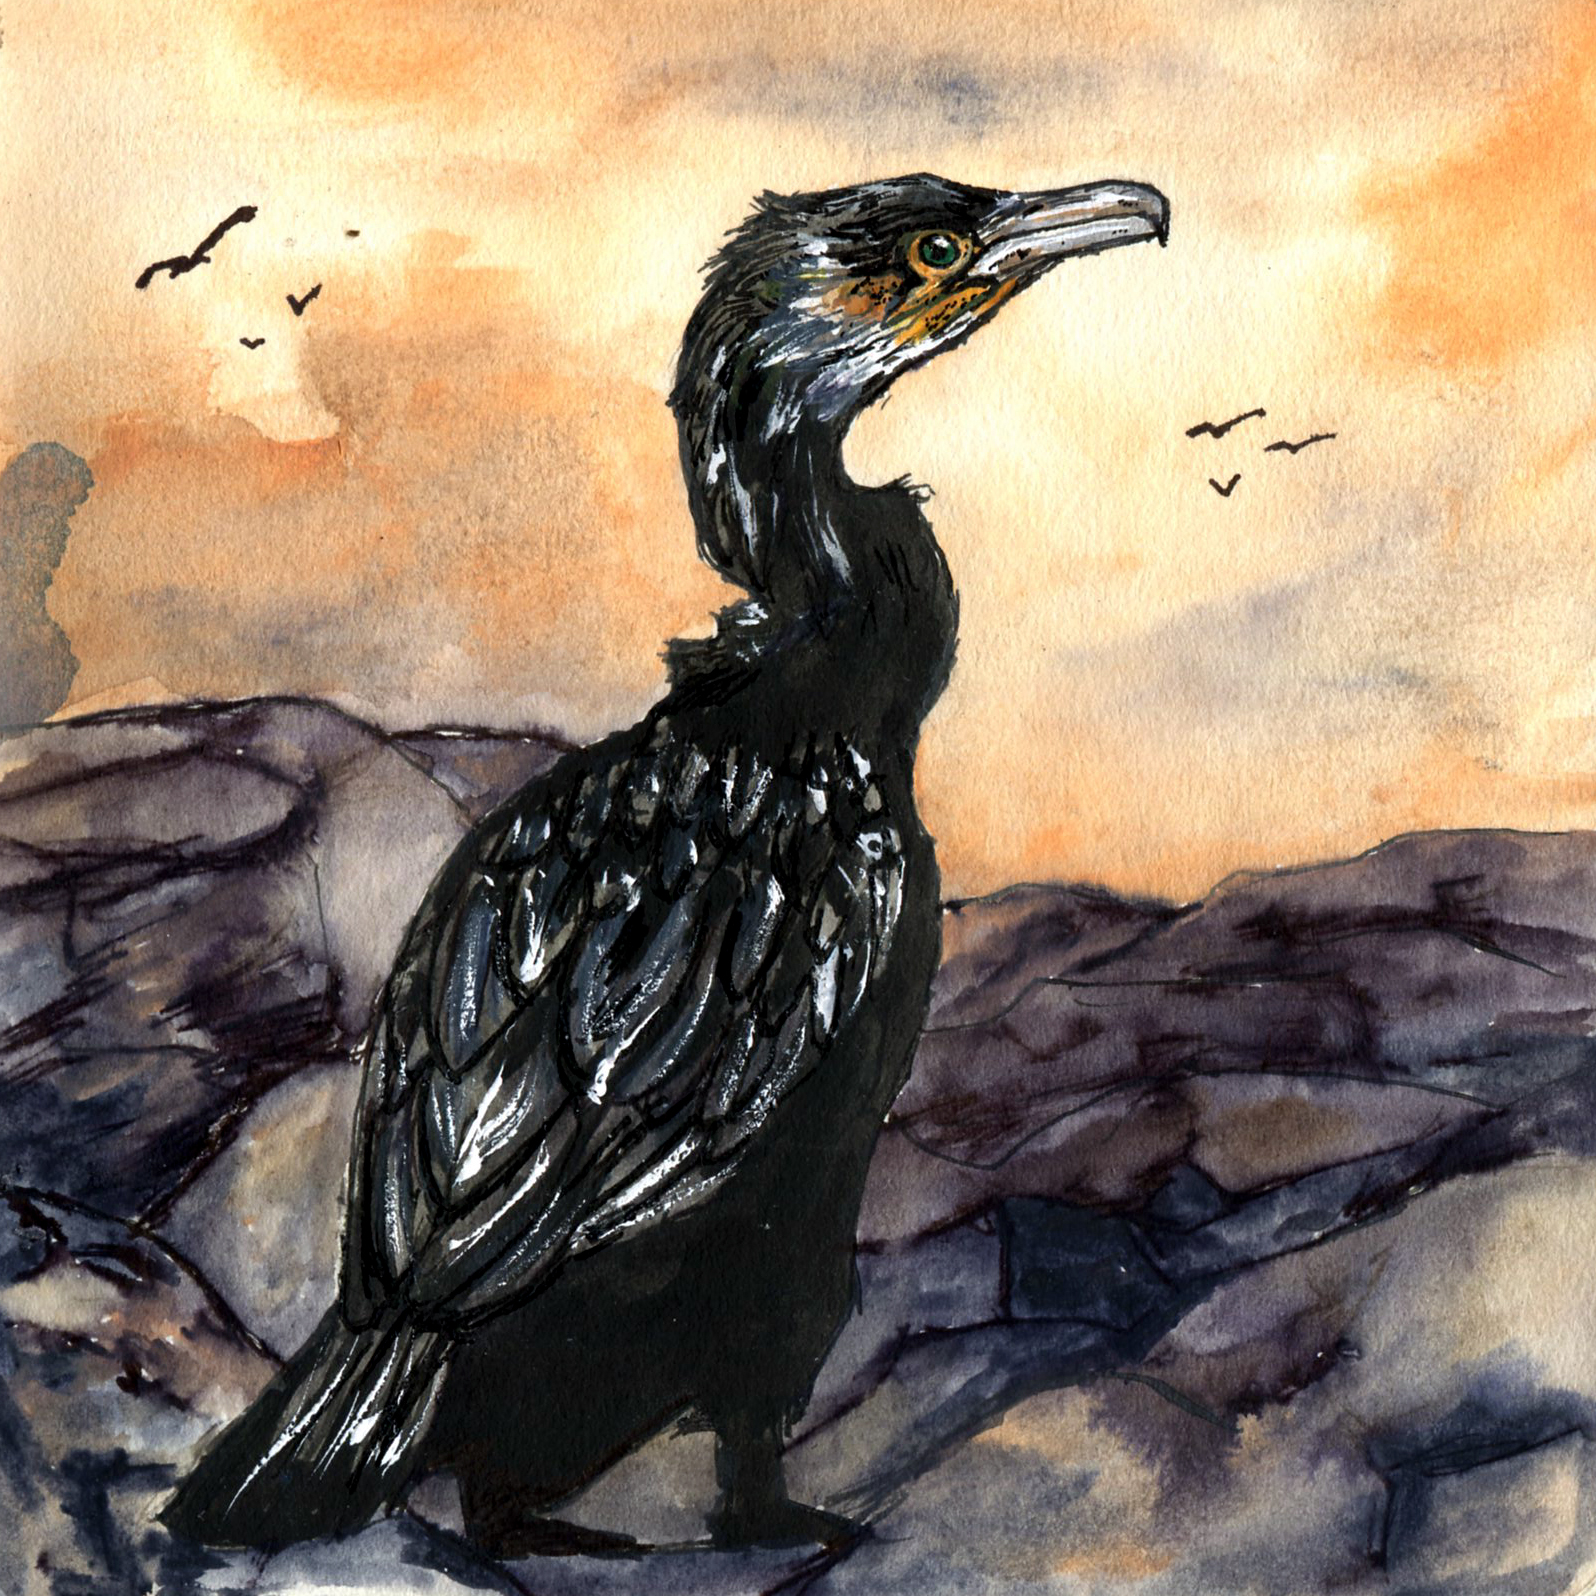 110. Great Cormorant